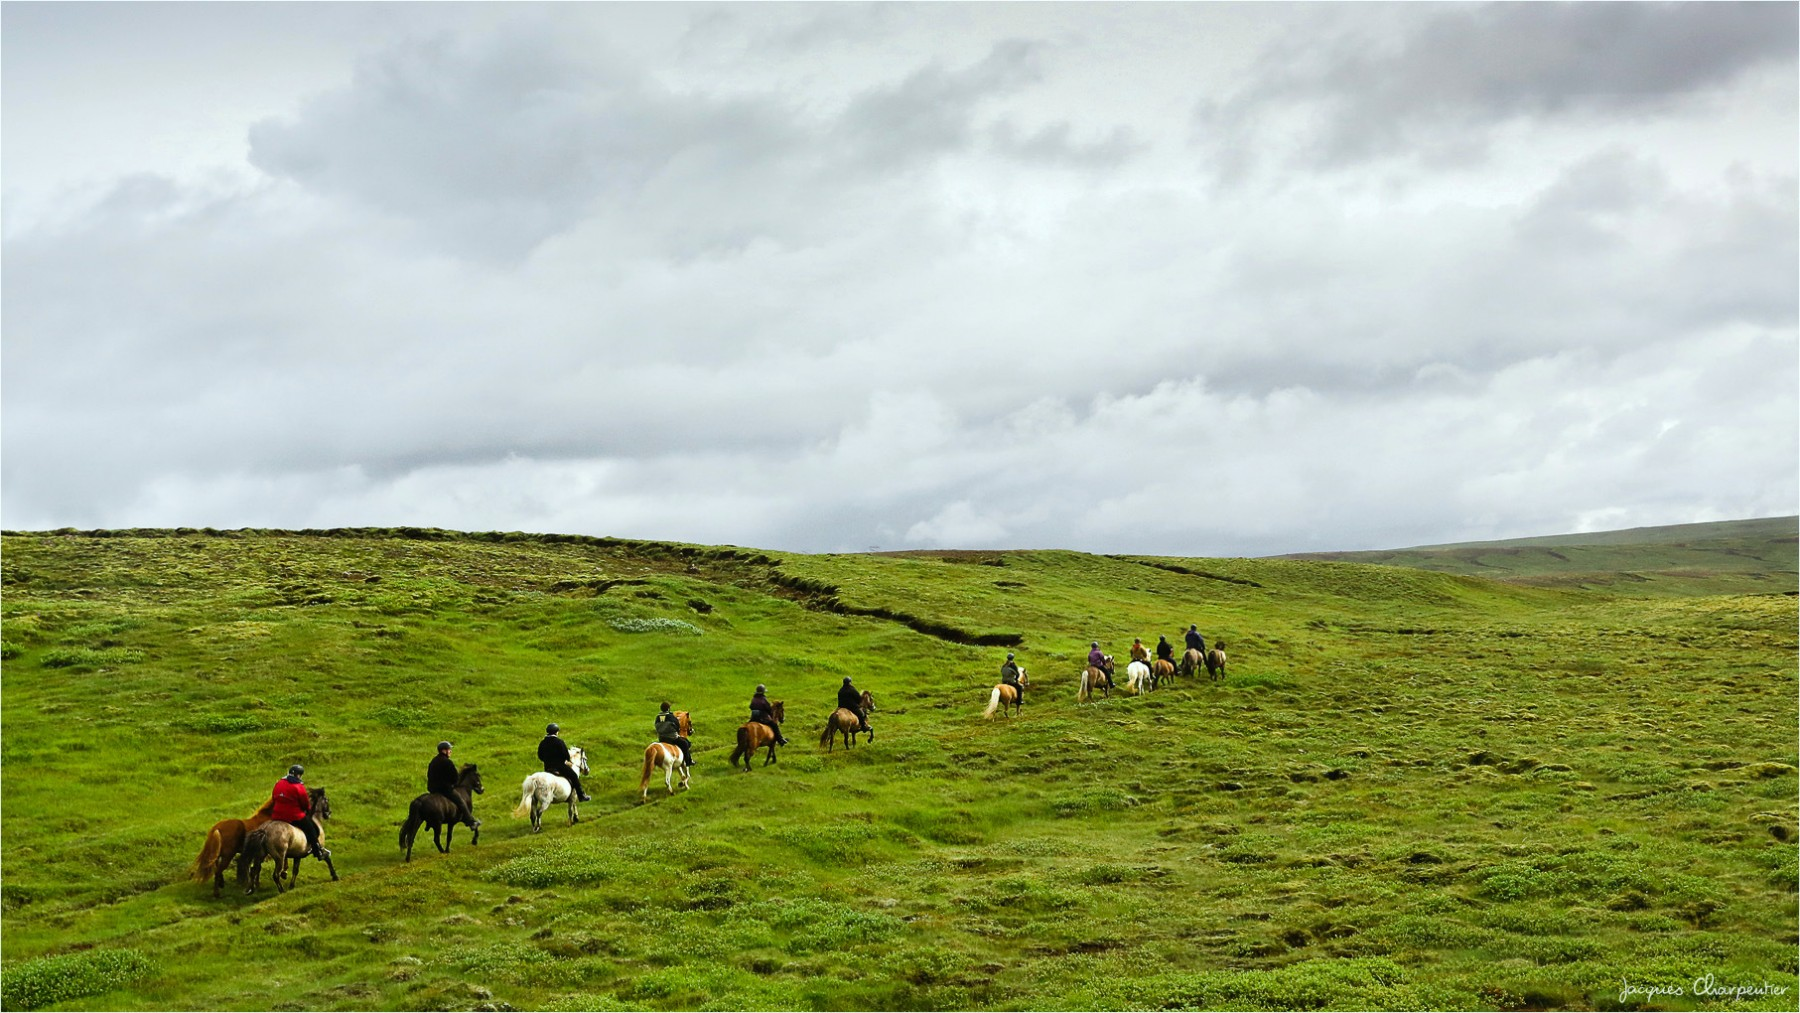 Sortie equestre, Islande 2016 © Jacques Charpentier